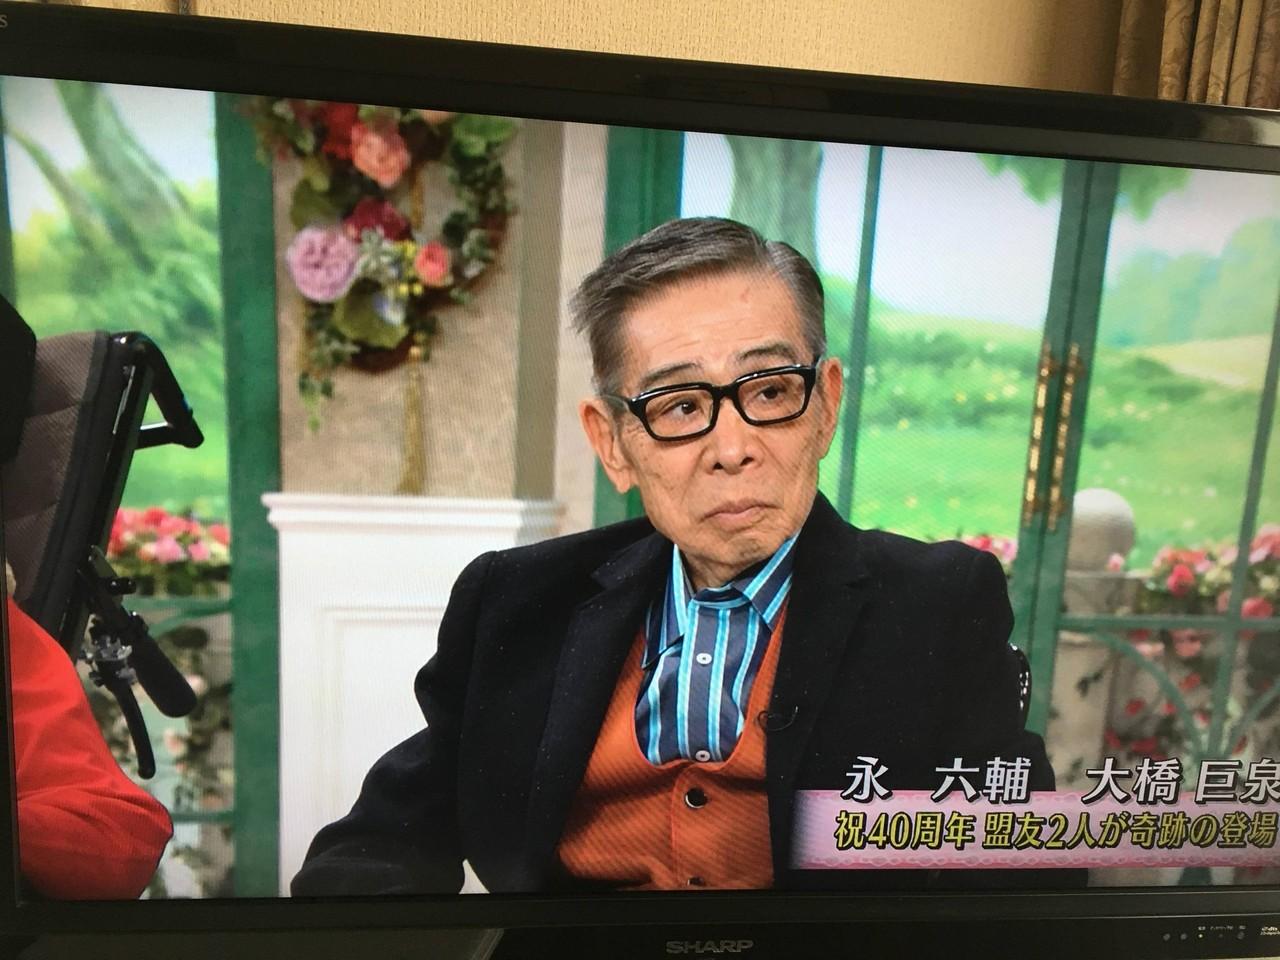 NHK「ラジオ深夜便」について語りましょうPart30 [無断転載禁止]©2ch.netYouTube動画>2本 ->画像>15枚